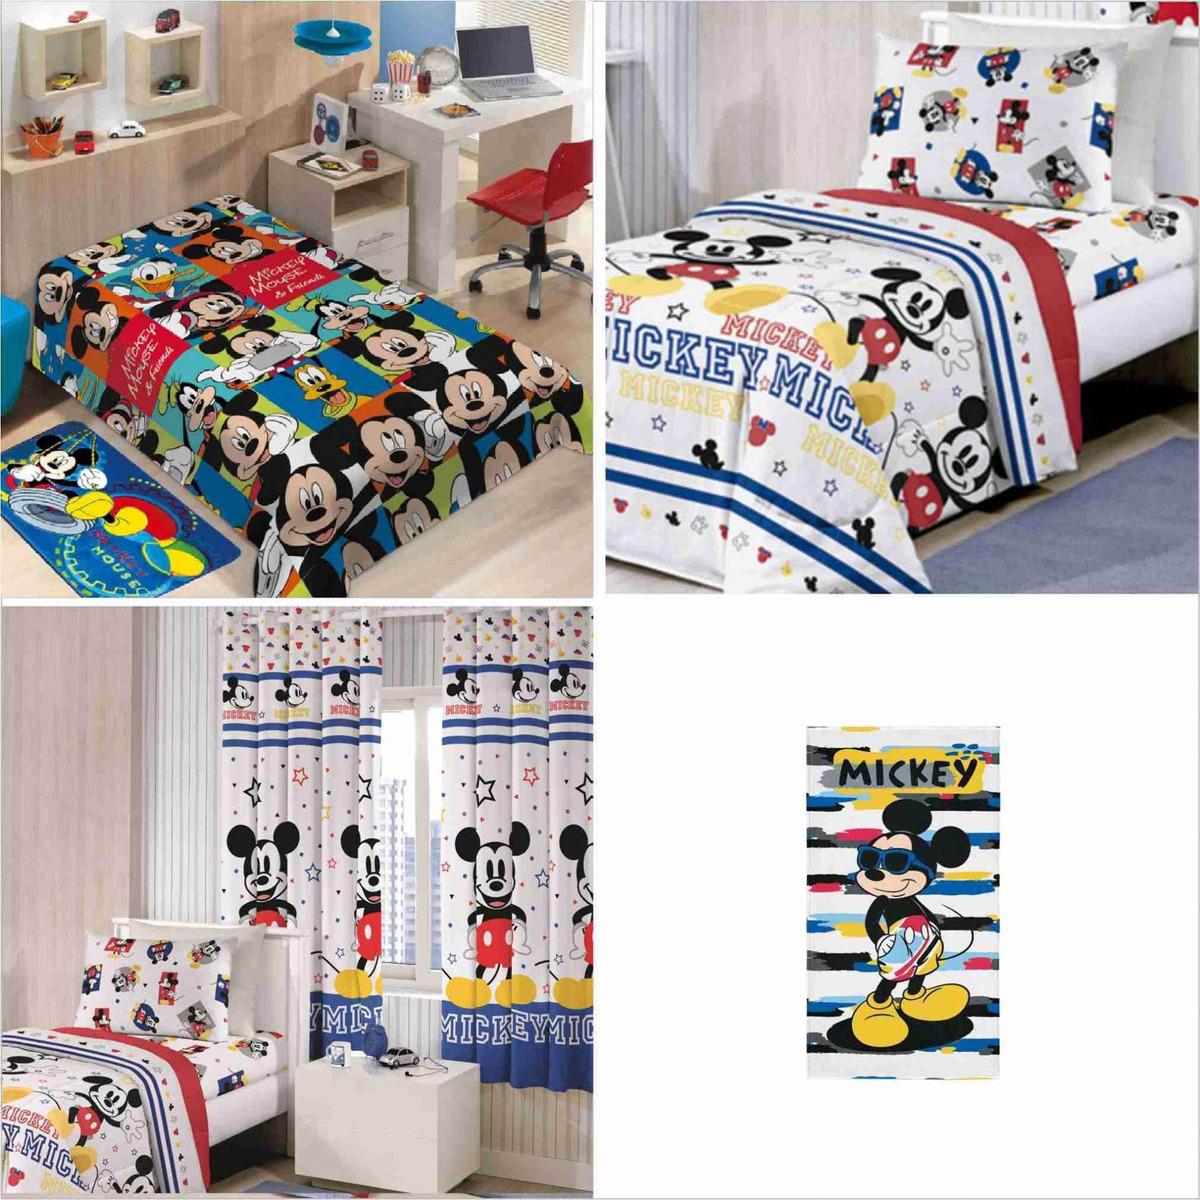 3a314e1e05 kit 6 pçs manta+ jogo cama+cortina+toalha mickey play disney. Carregando  zoom.